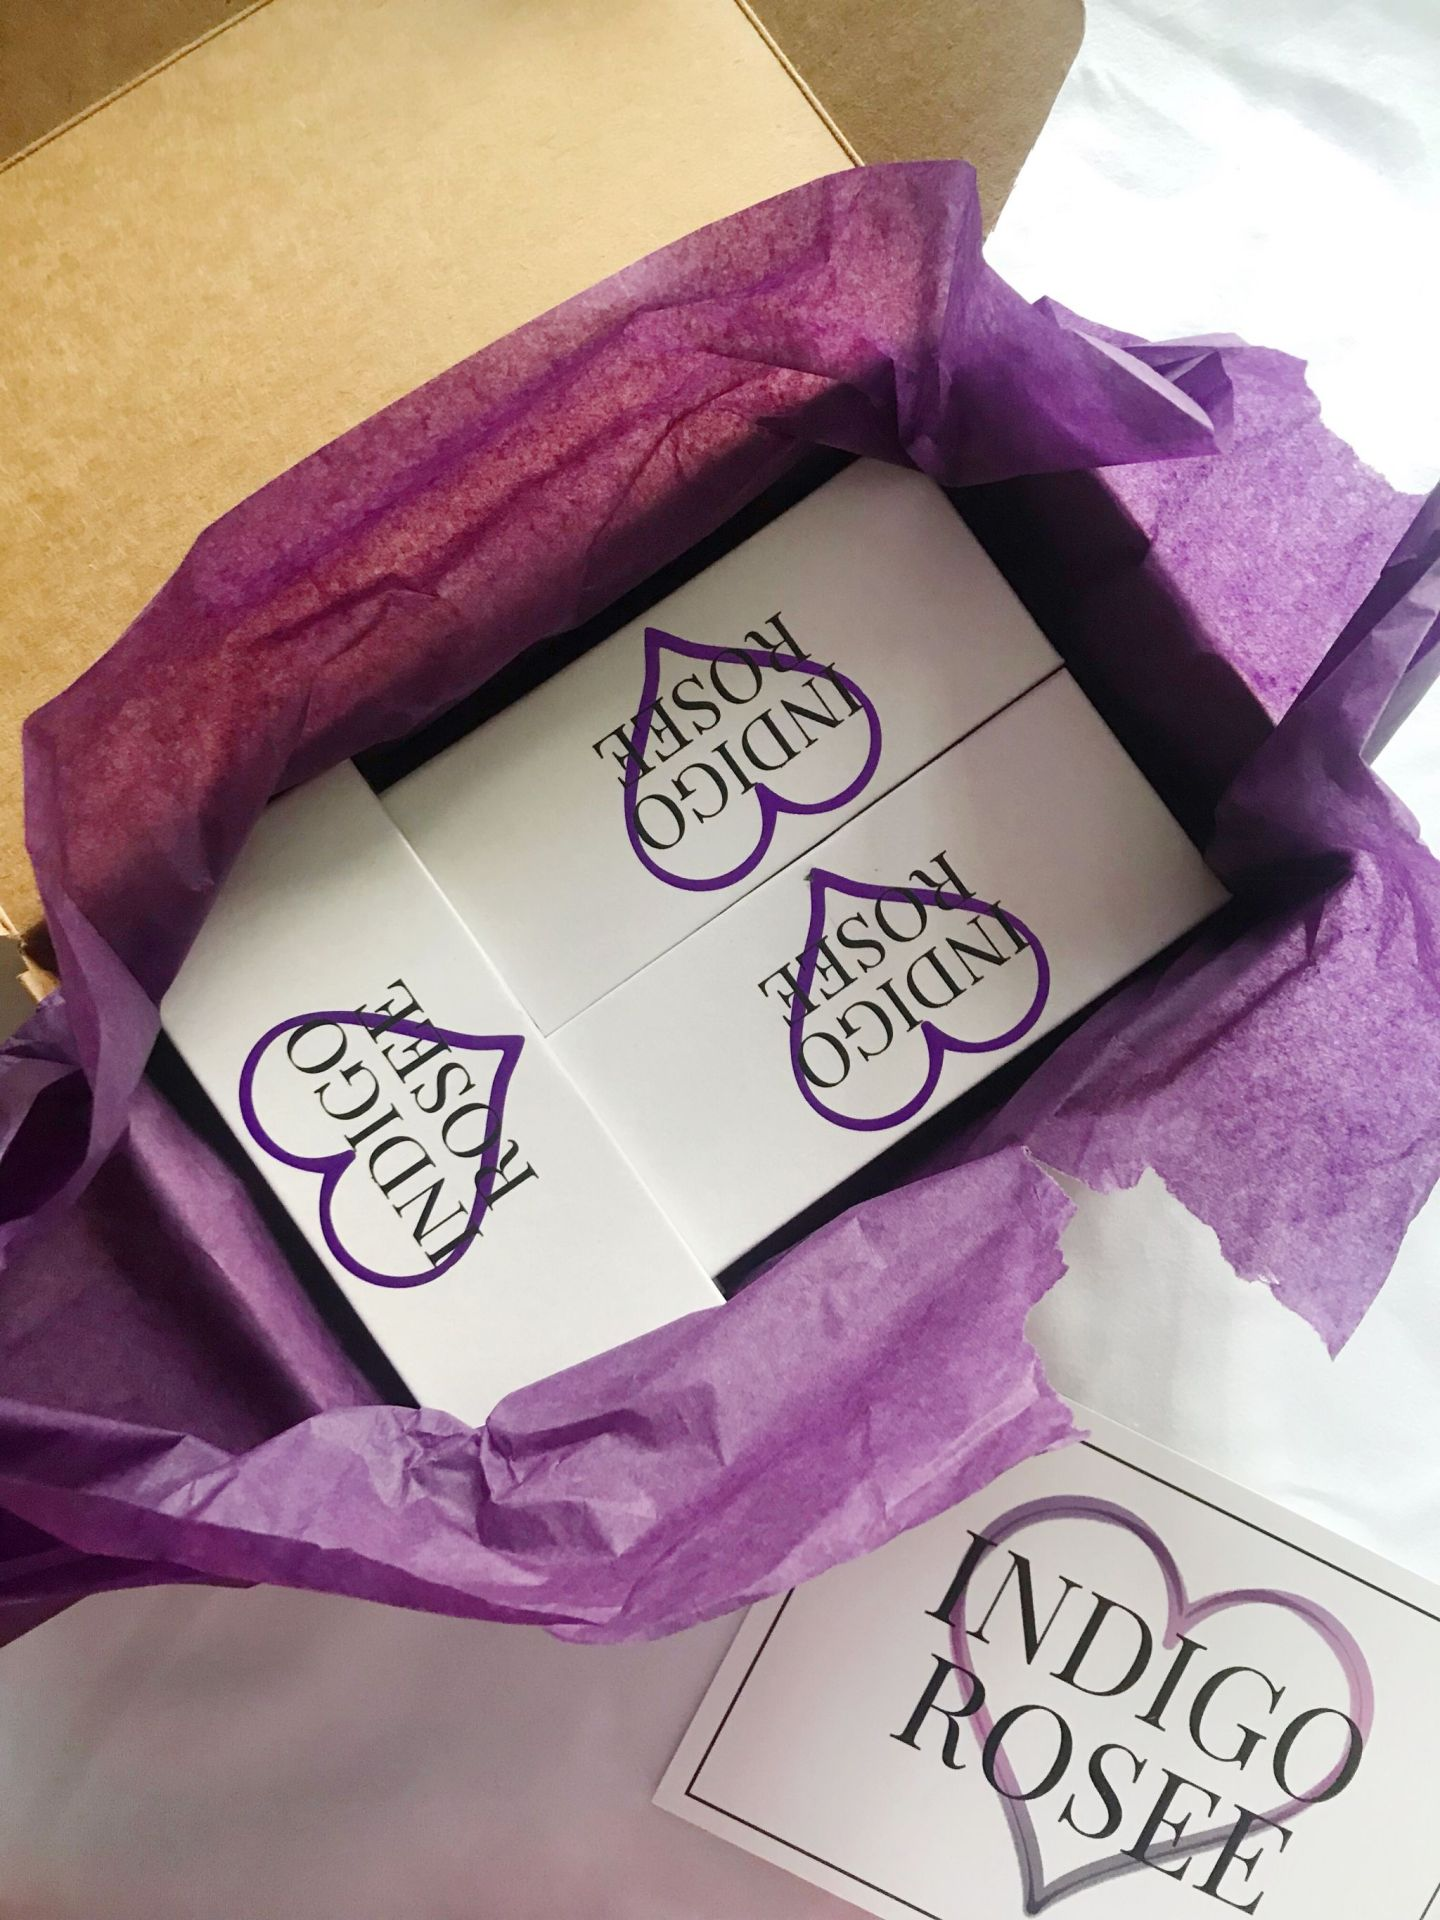 opening Indigo Rosee Beauty package